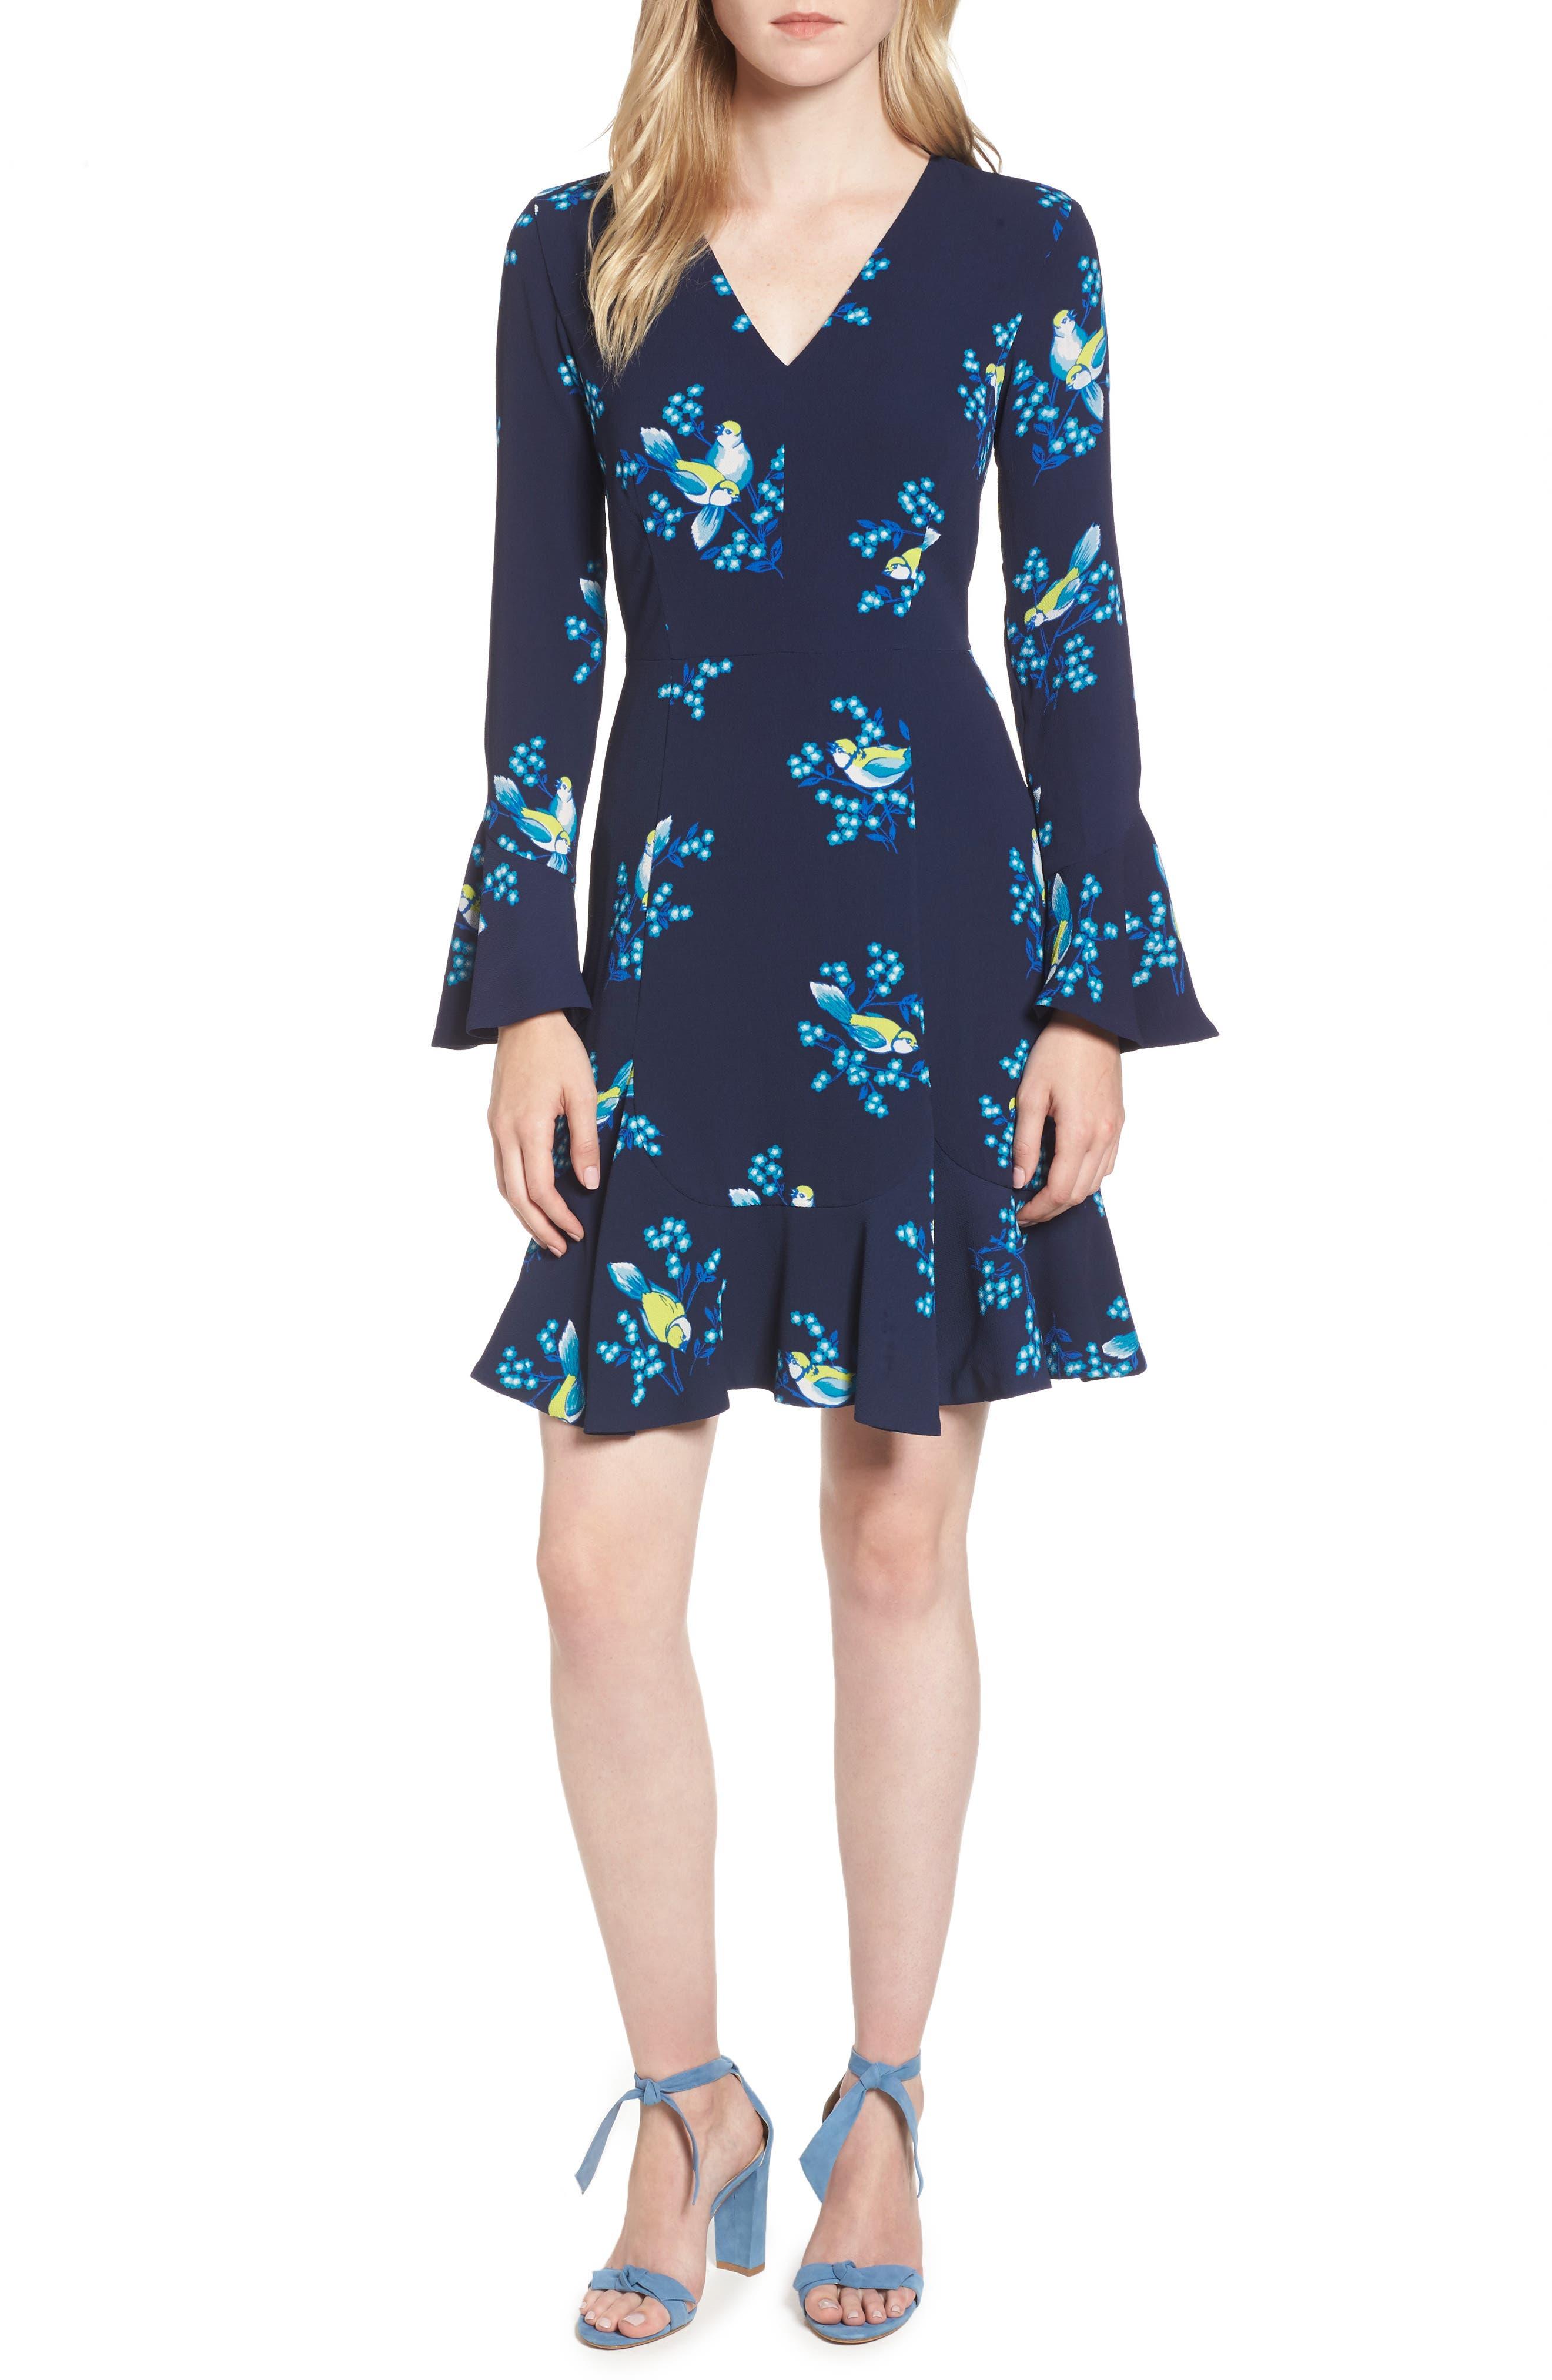 Magnolia Mockingbird Bell Sleeve A-line Dress,                             Main thumbnail 1, color,                             432